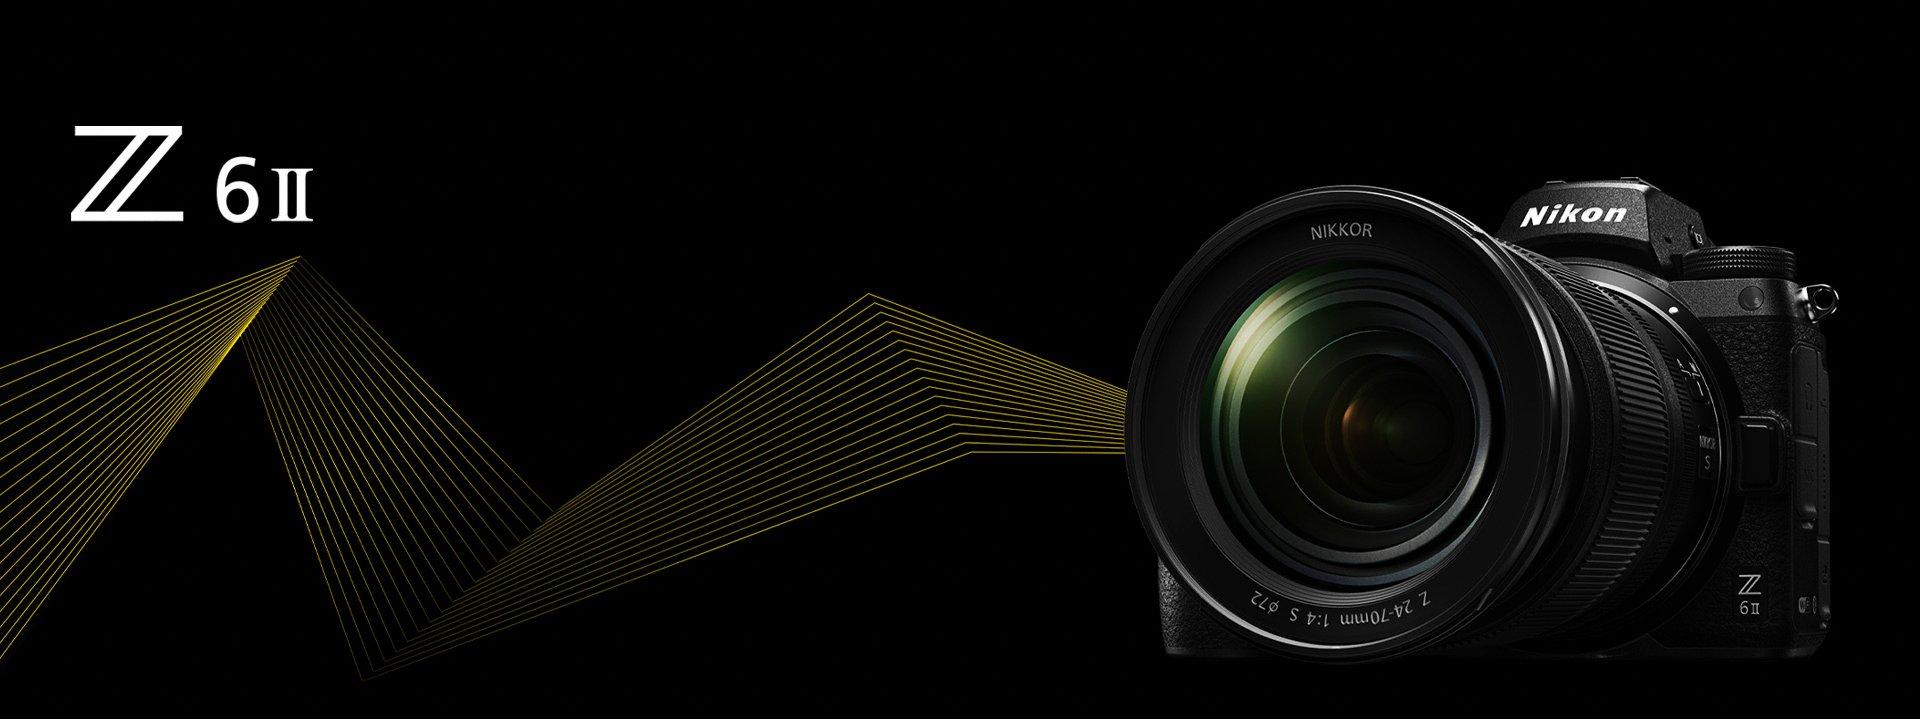 Manuale Nikon Z6 II ora disponibile online